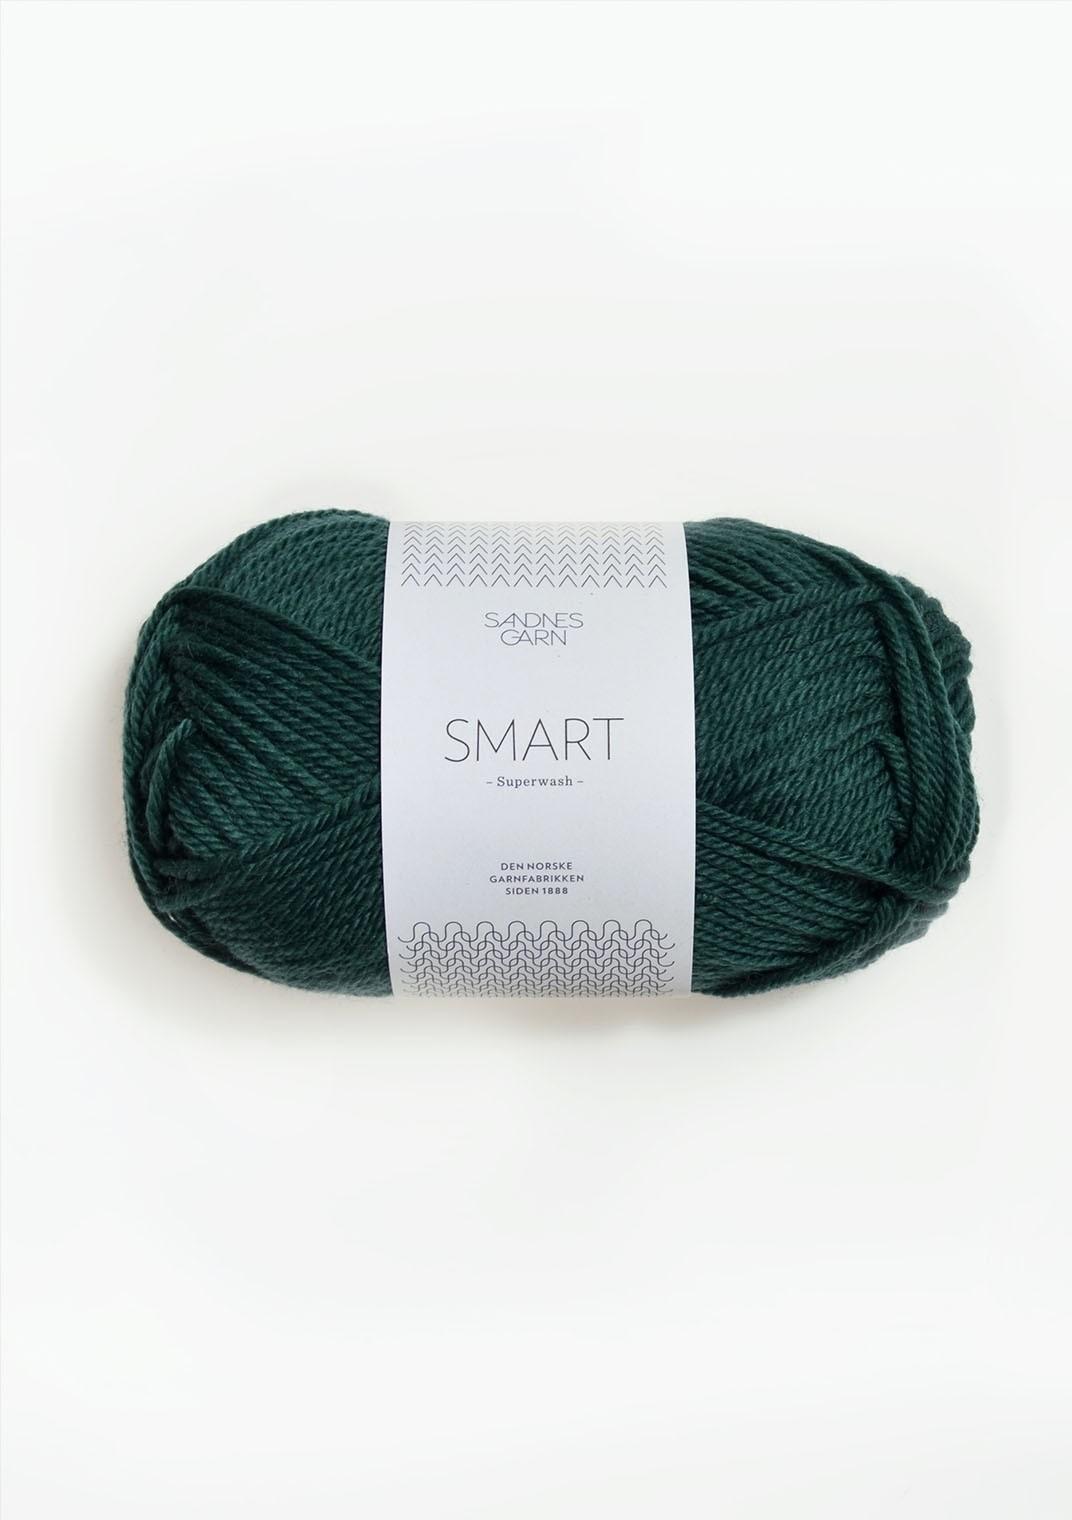 Sandnes smart 6765